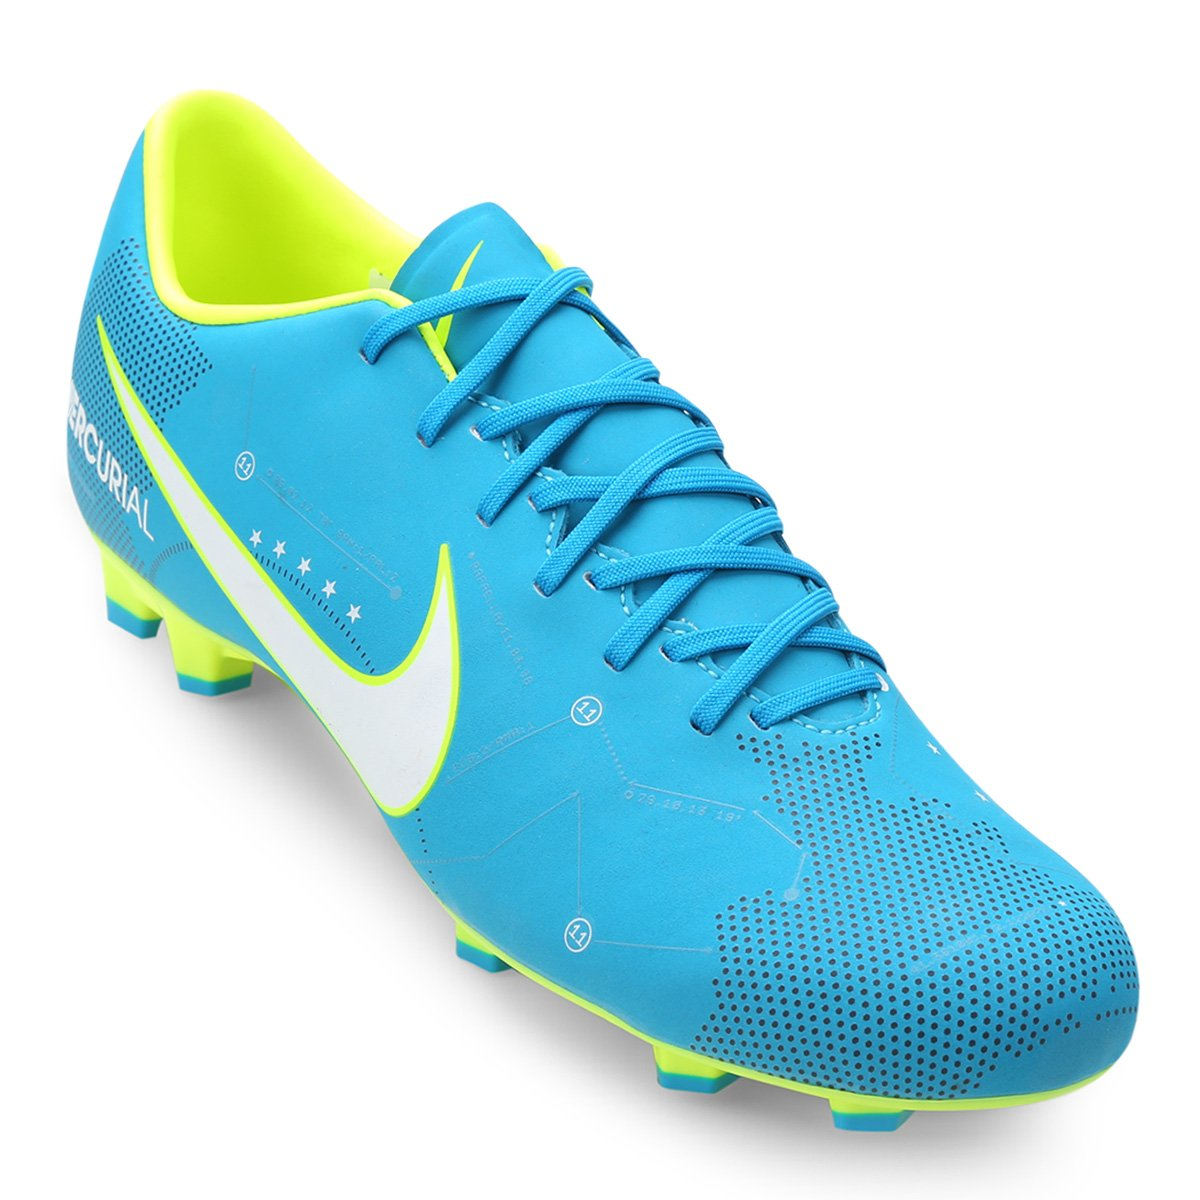 8bd97847000bb Chuteira Campo Nike Victory 6 Neymar Jr FG | Shop Timão